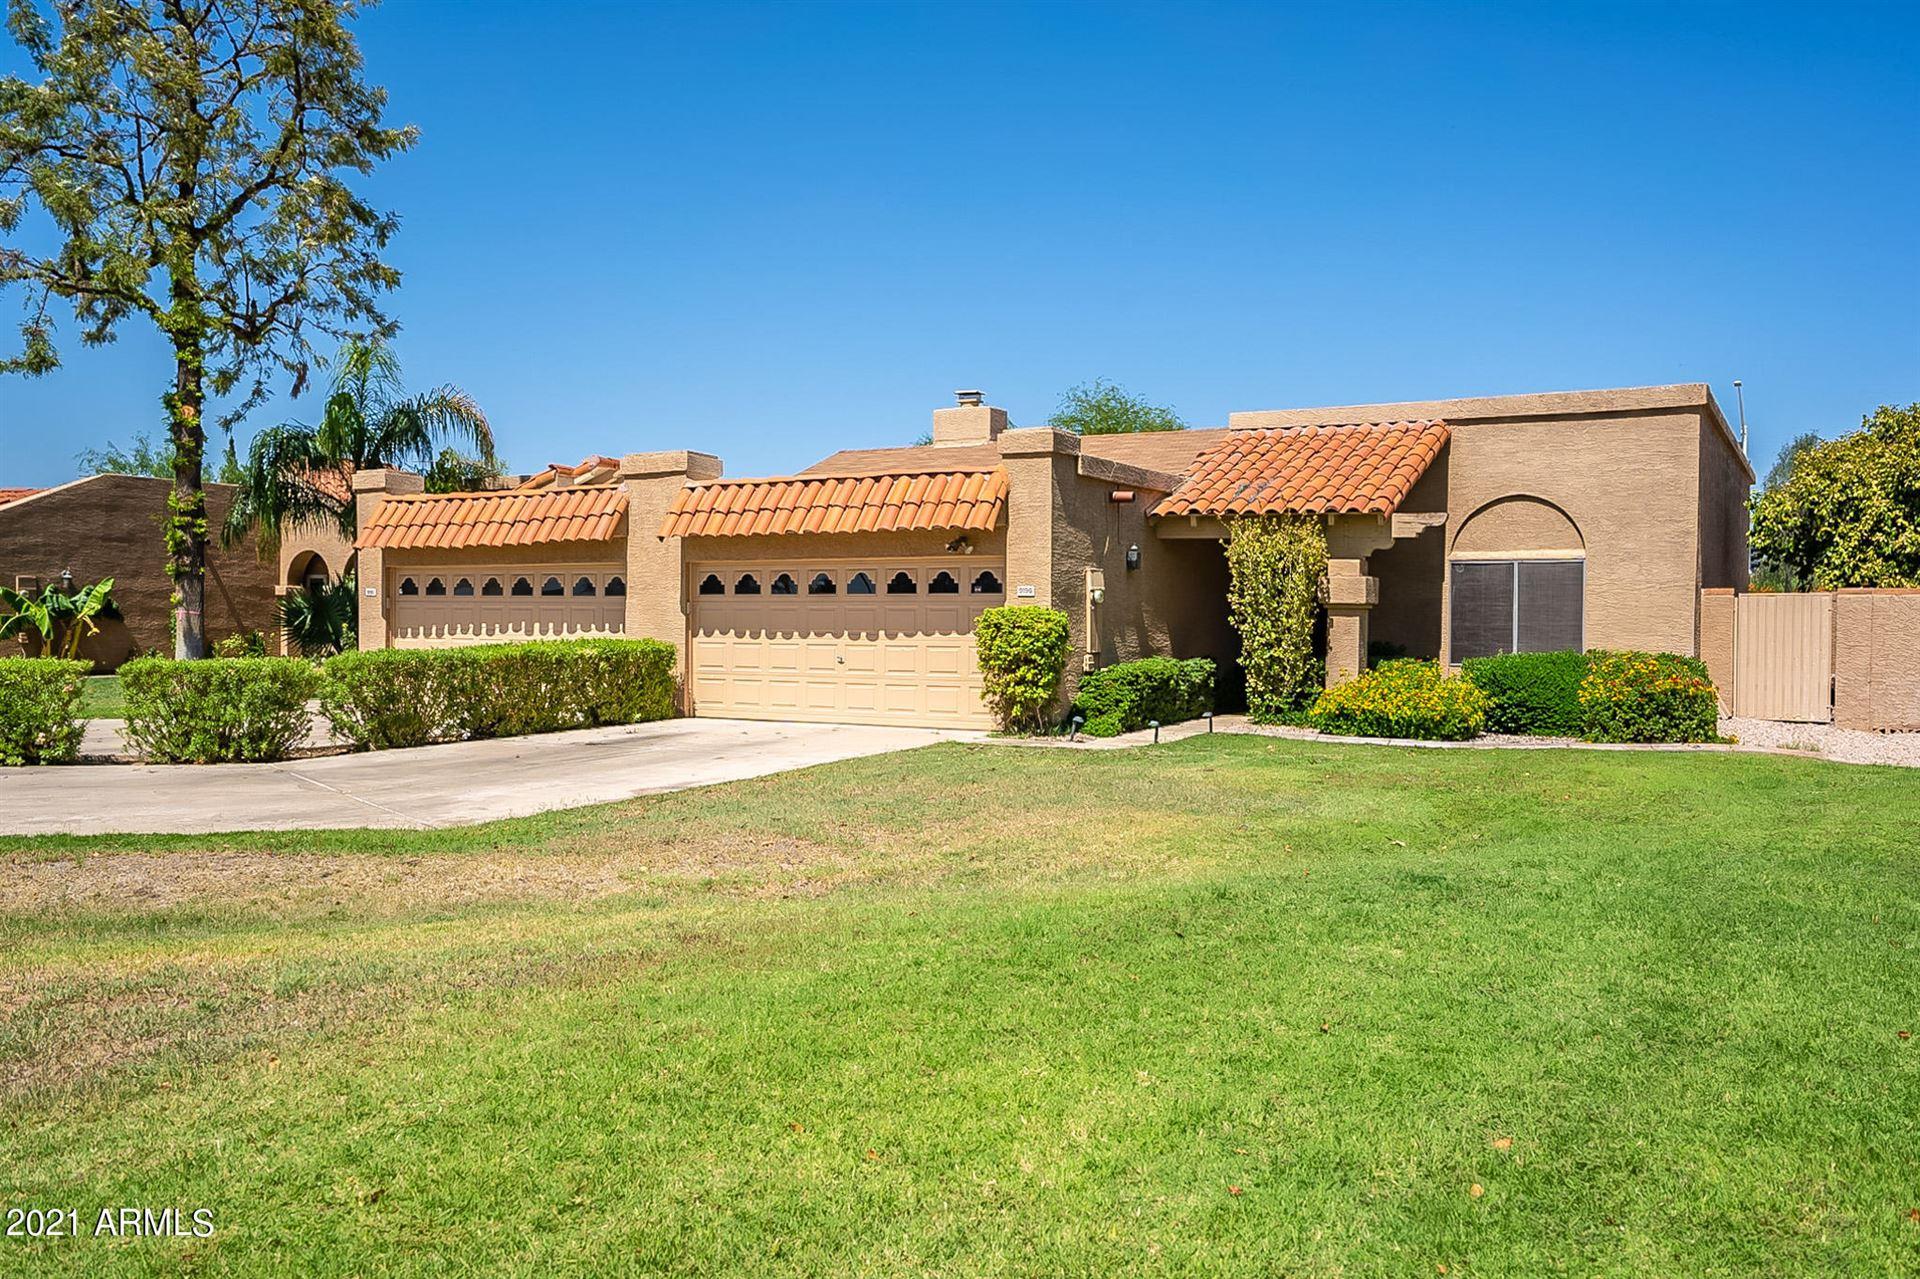 9196 E EVANS Drive, Scottsdale, AZ 85260 - MLS#: 6198389